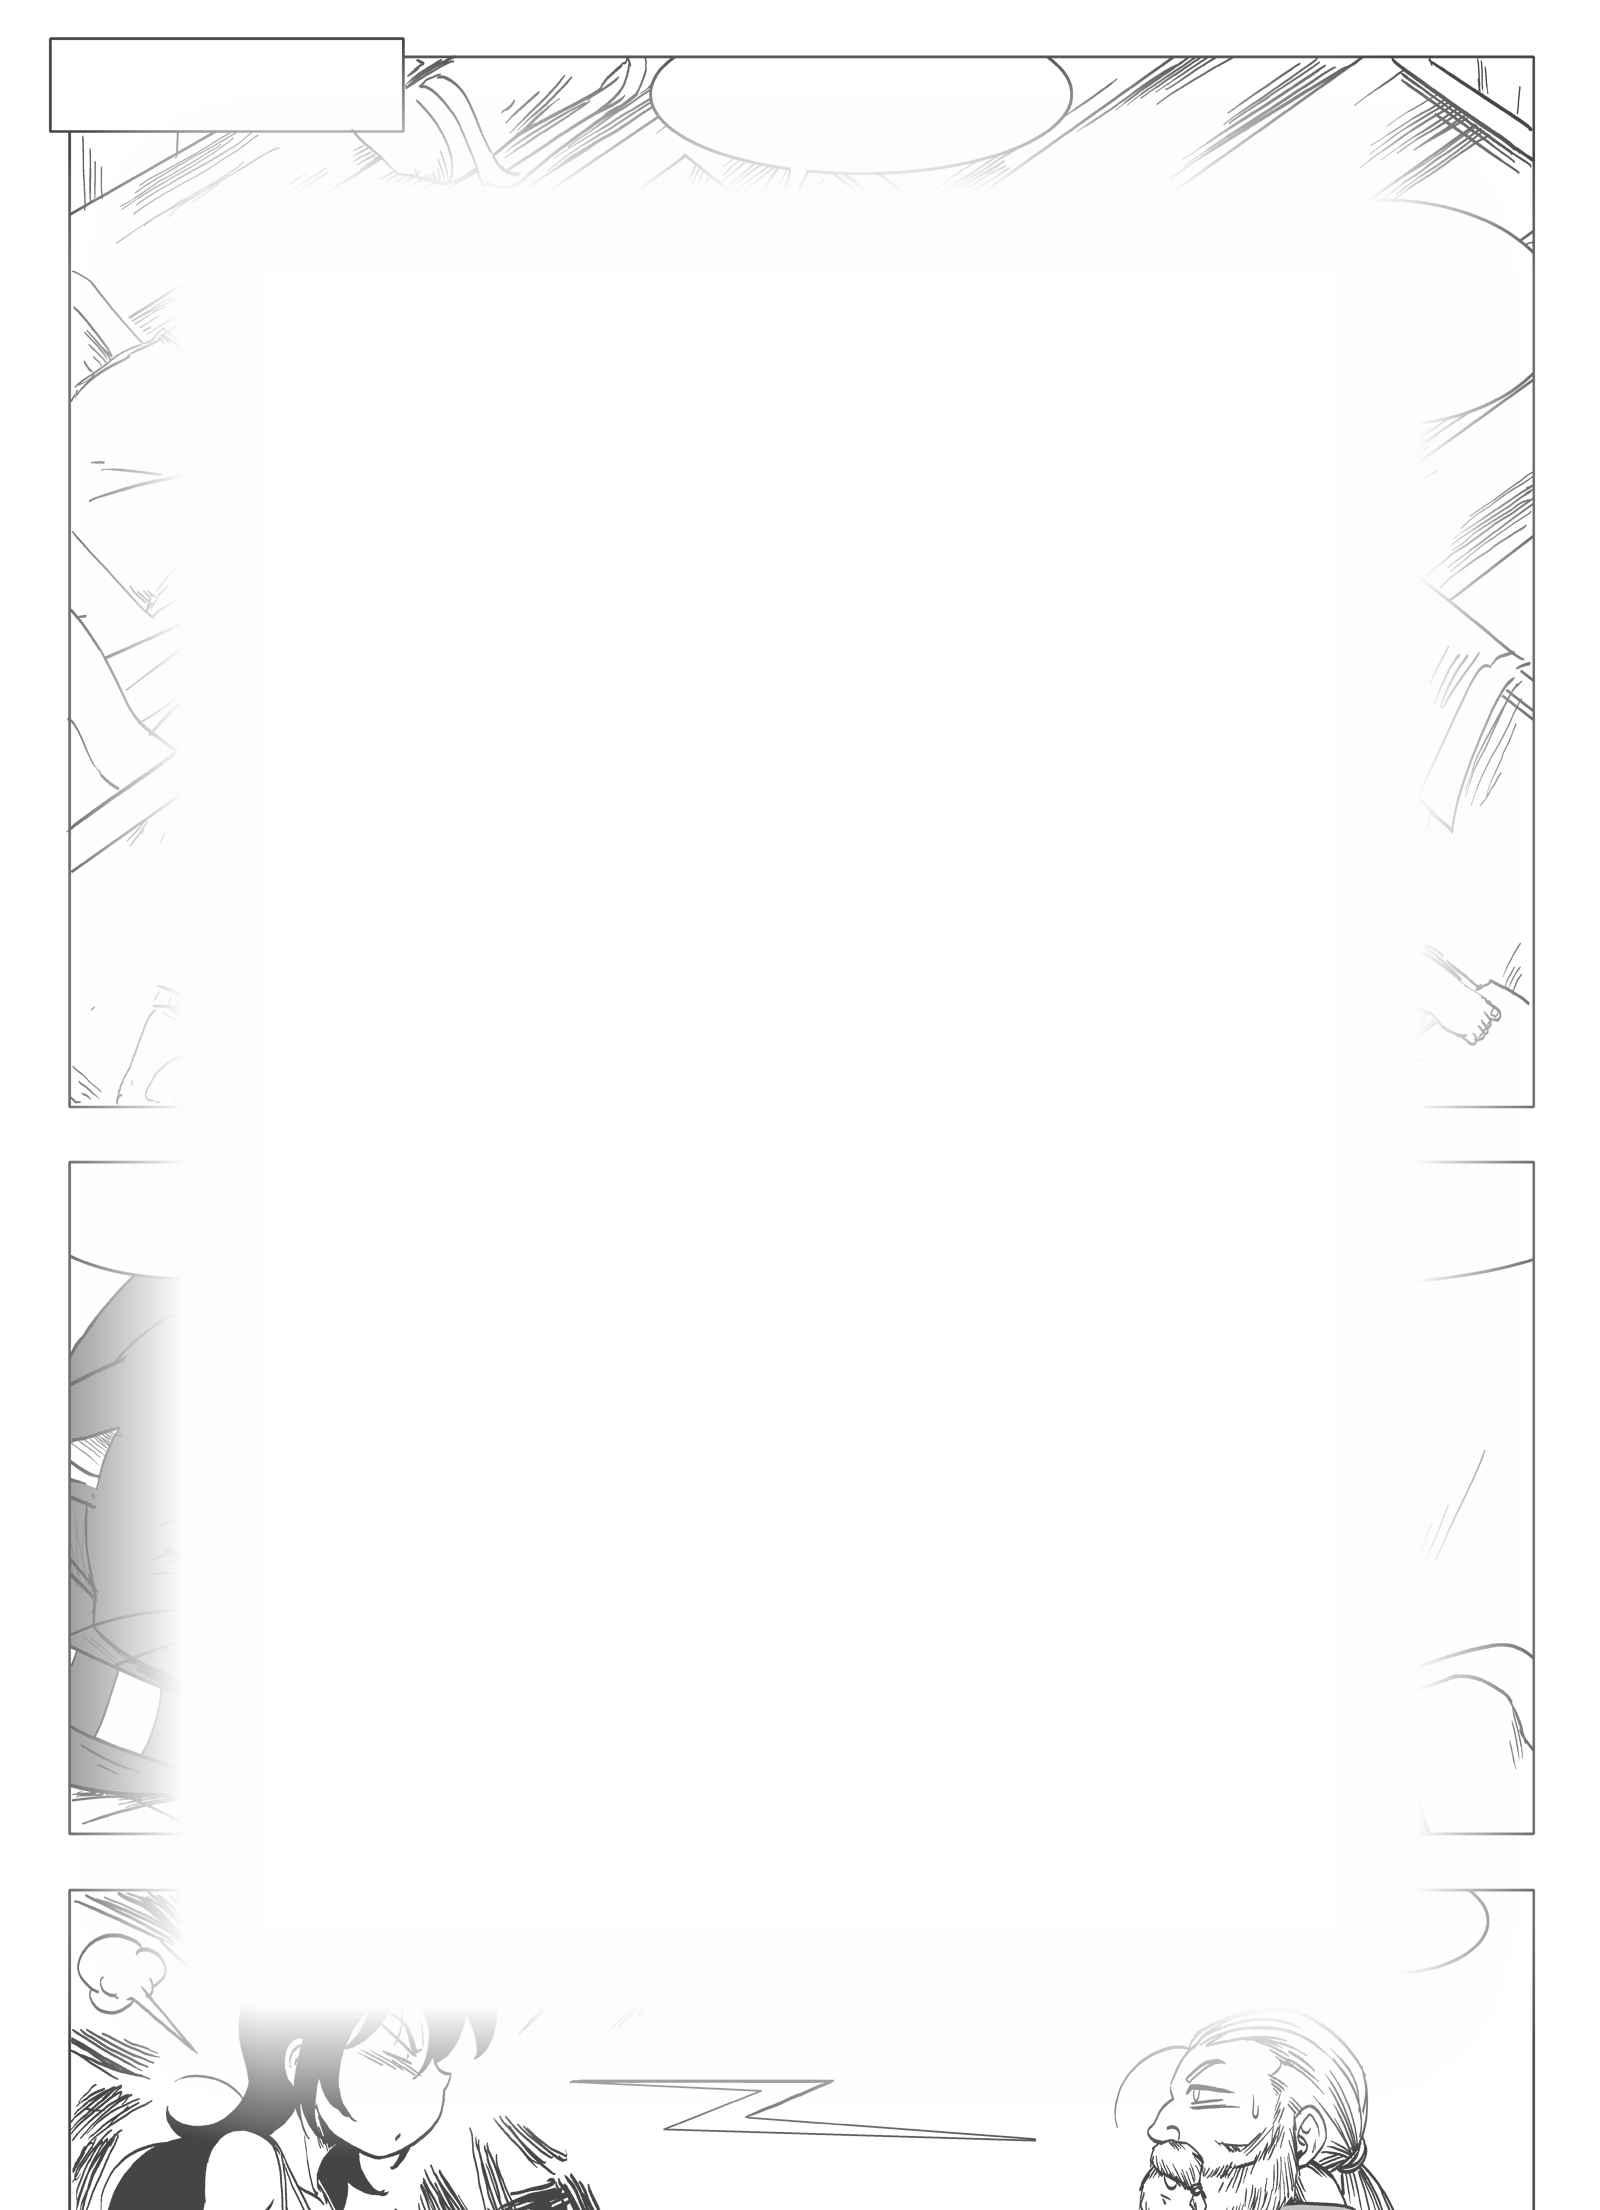 Hemispheres : Chapitre 23 page 8